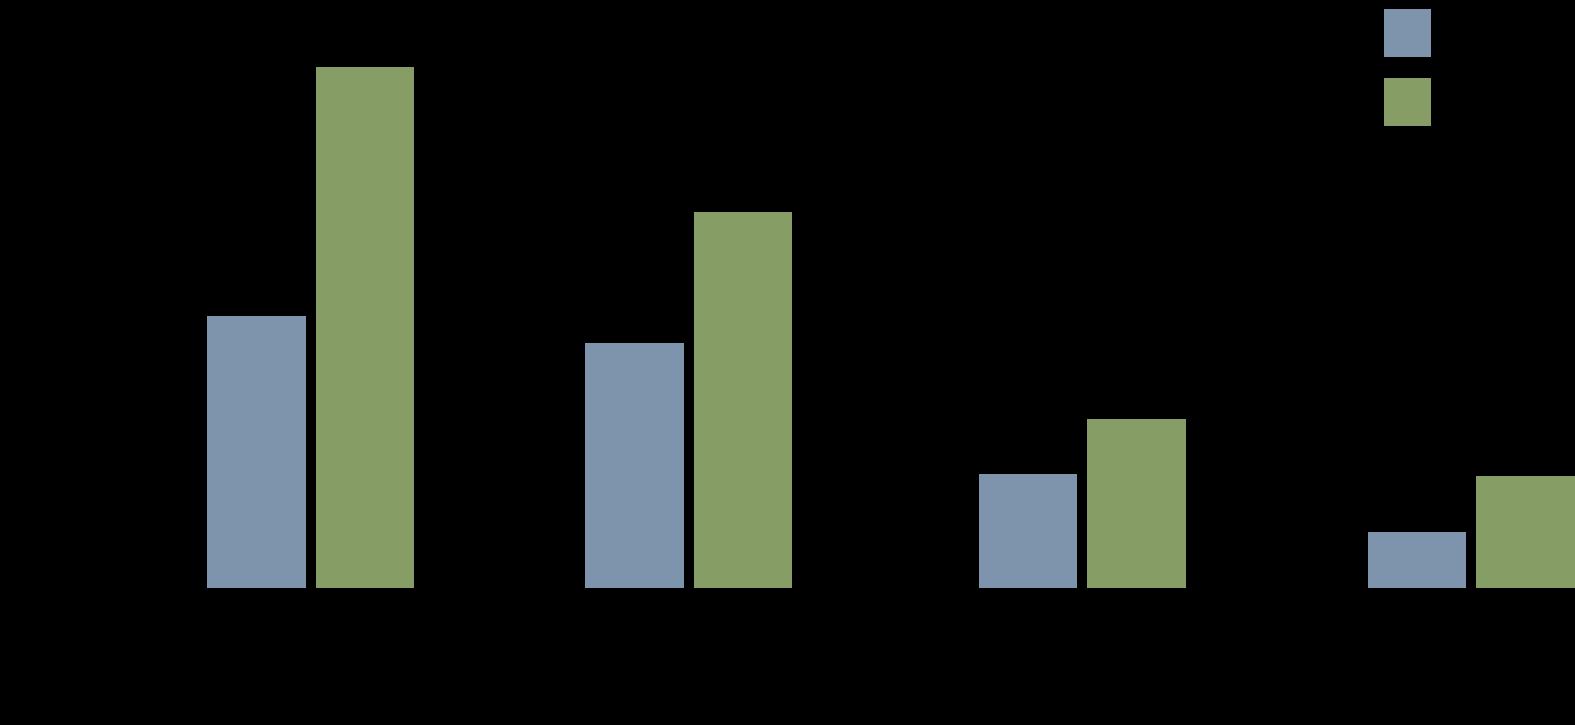 Source: KWS and TAWIRI aerial census data.